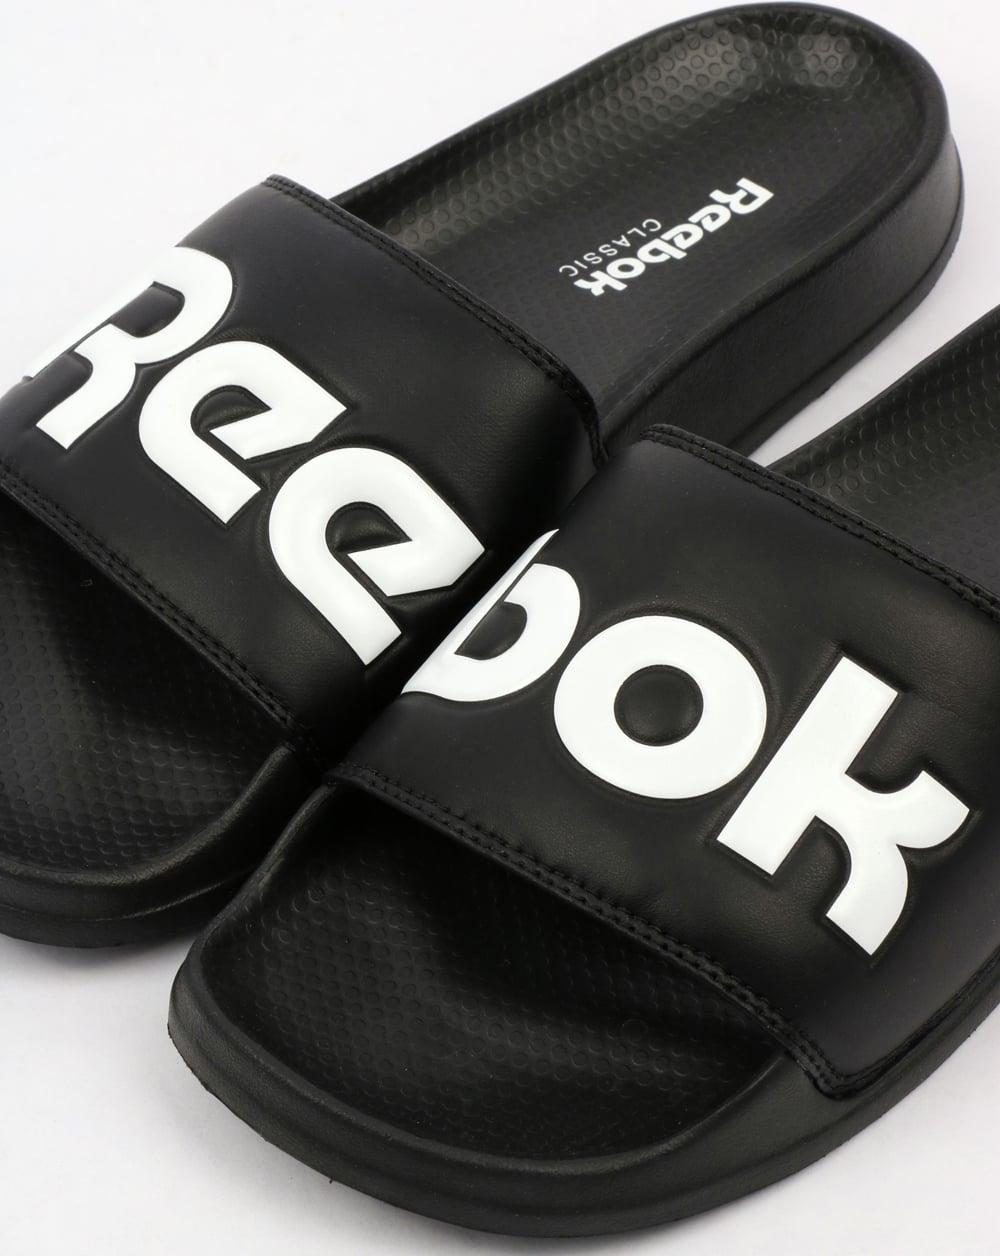 bb2d54018d6bac Reebok Classic Logo Sliders Black